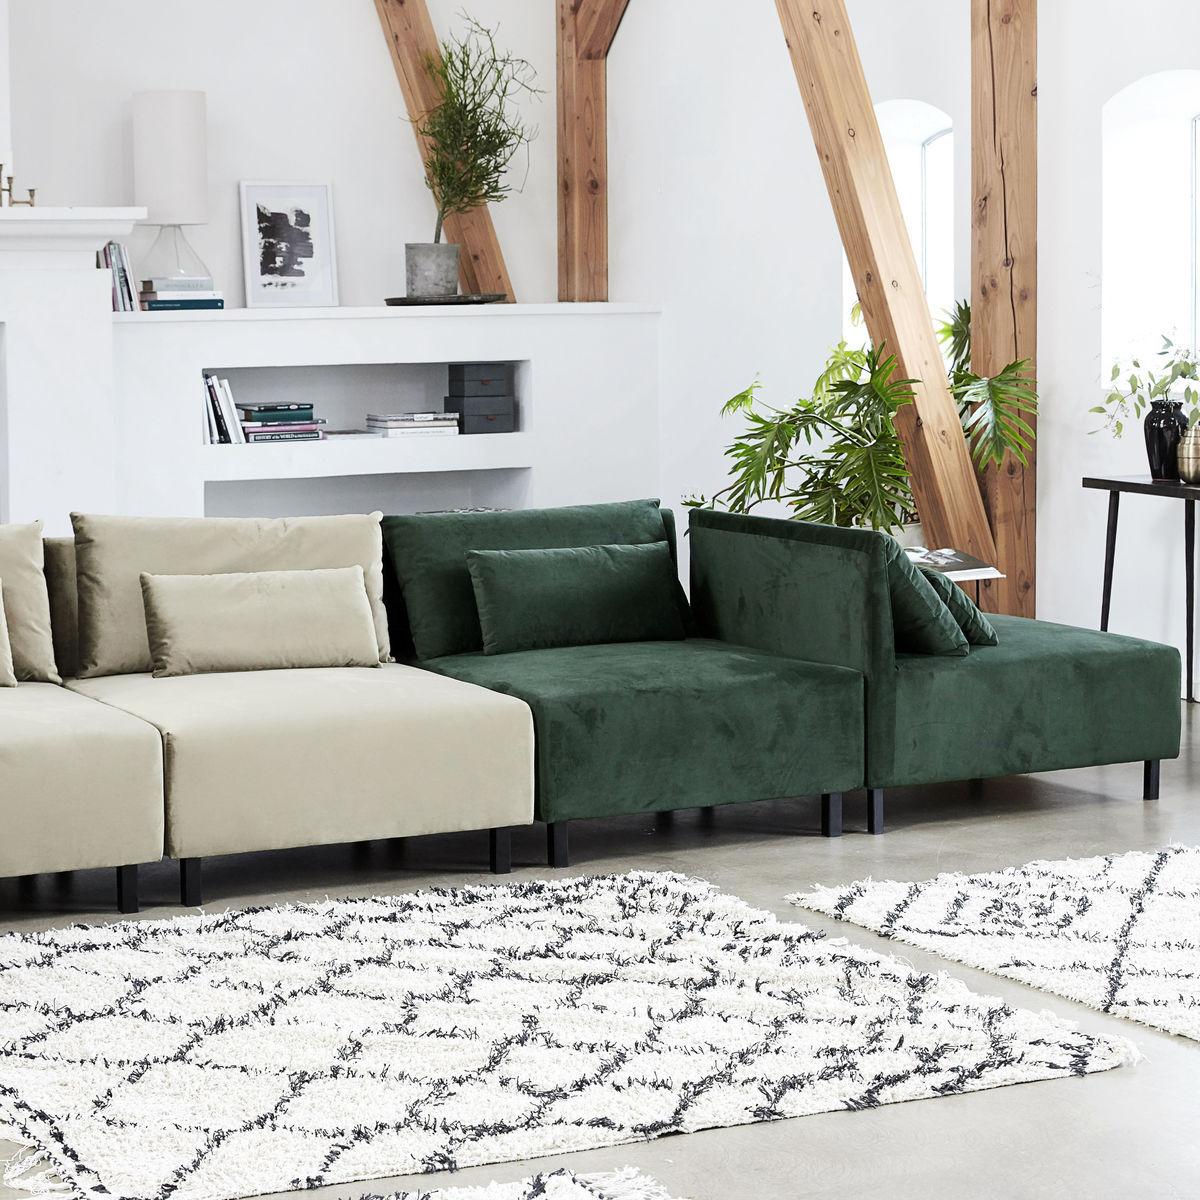 canap modulable box house doctor velours vert beluga. Black Bedroom Furniture Sets. Home Design Ideas